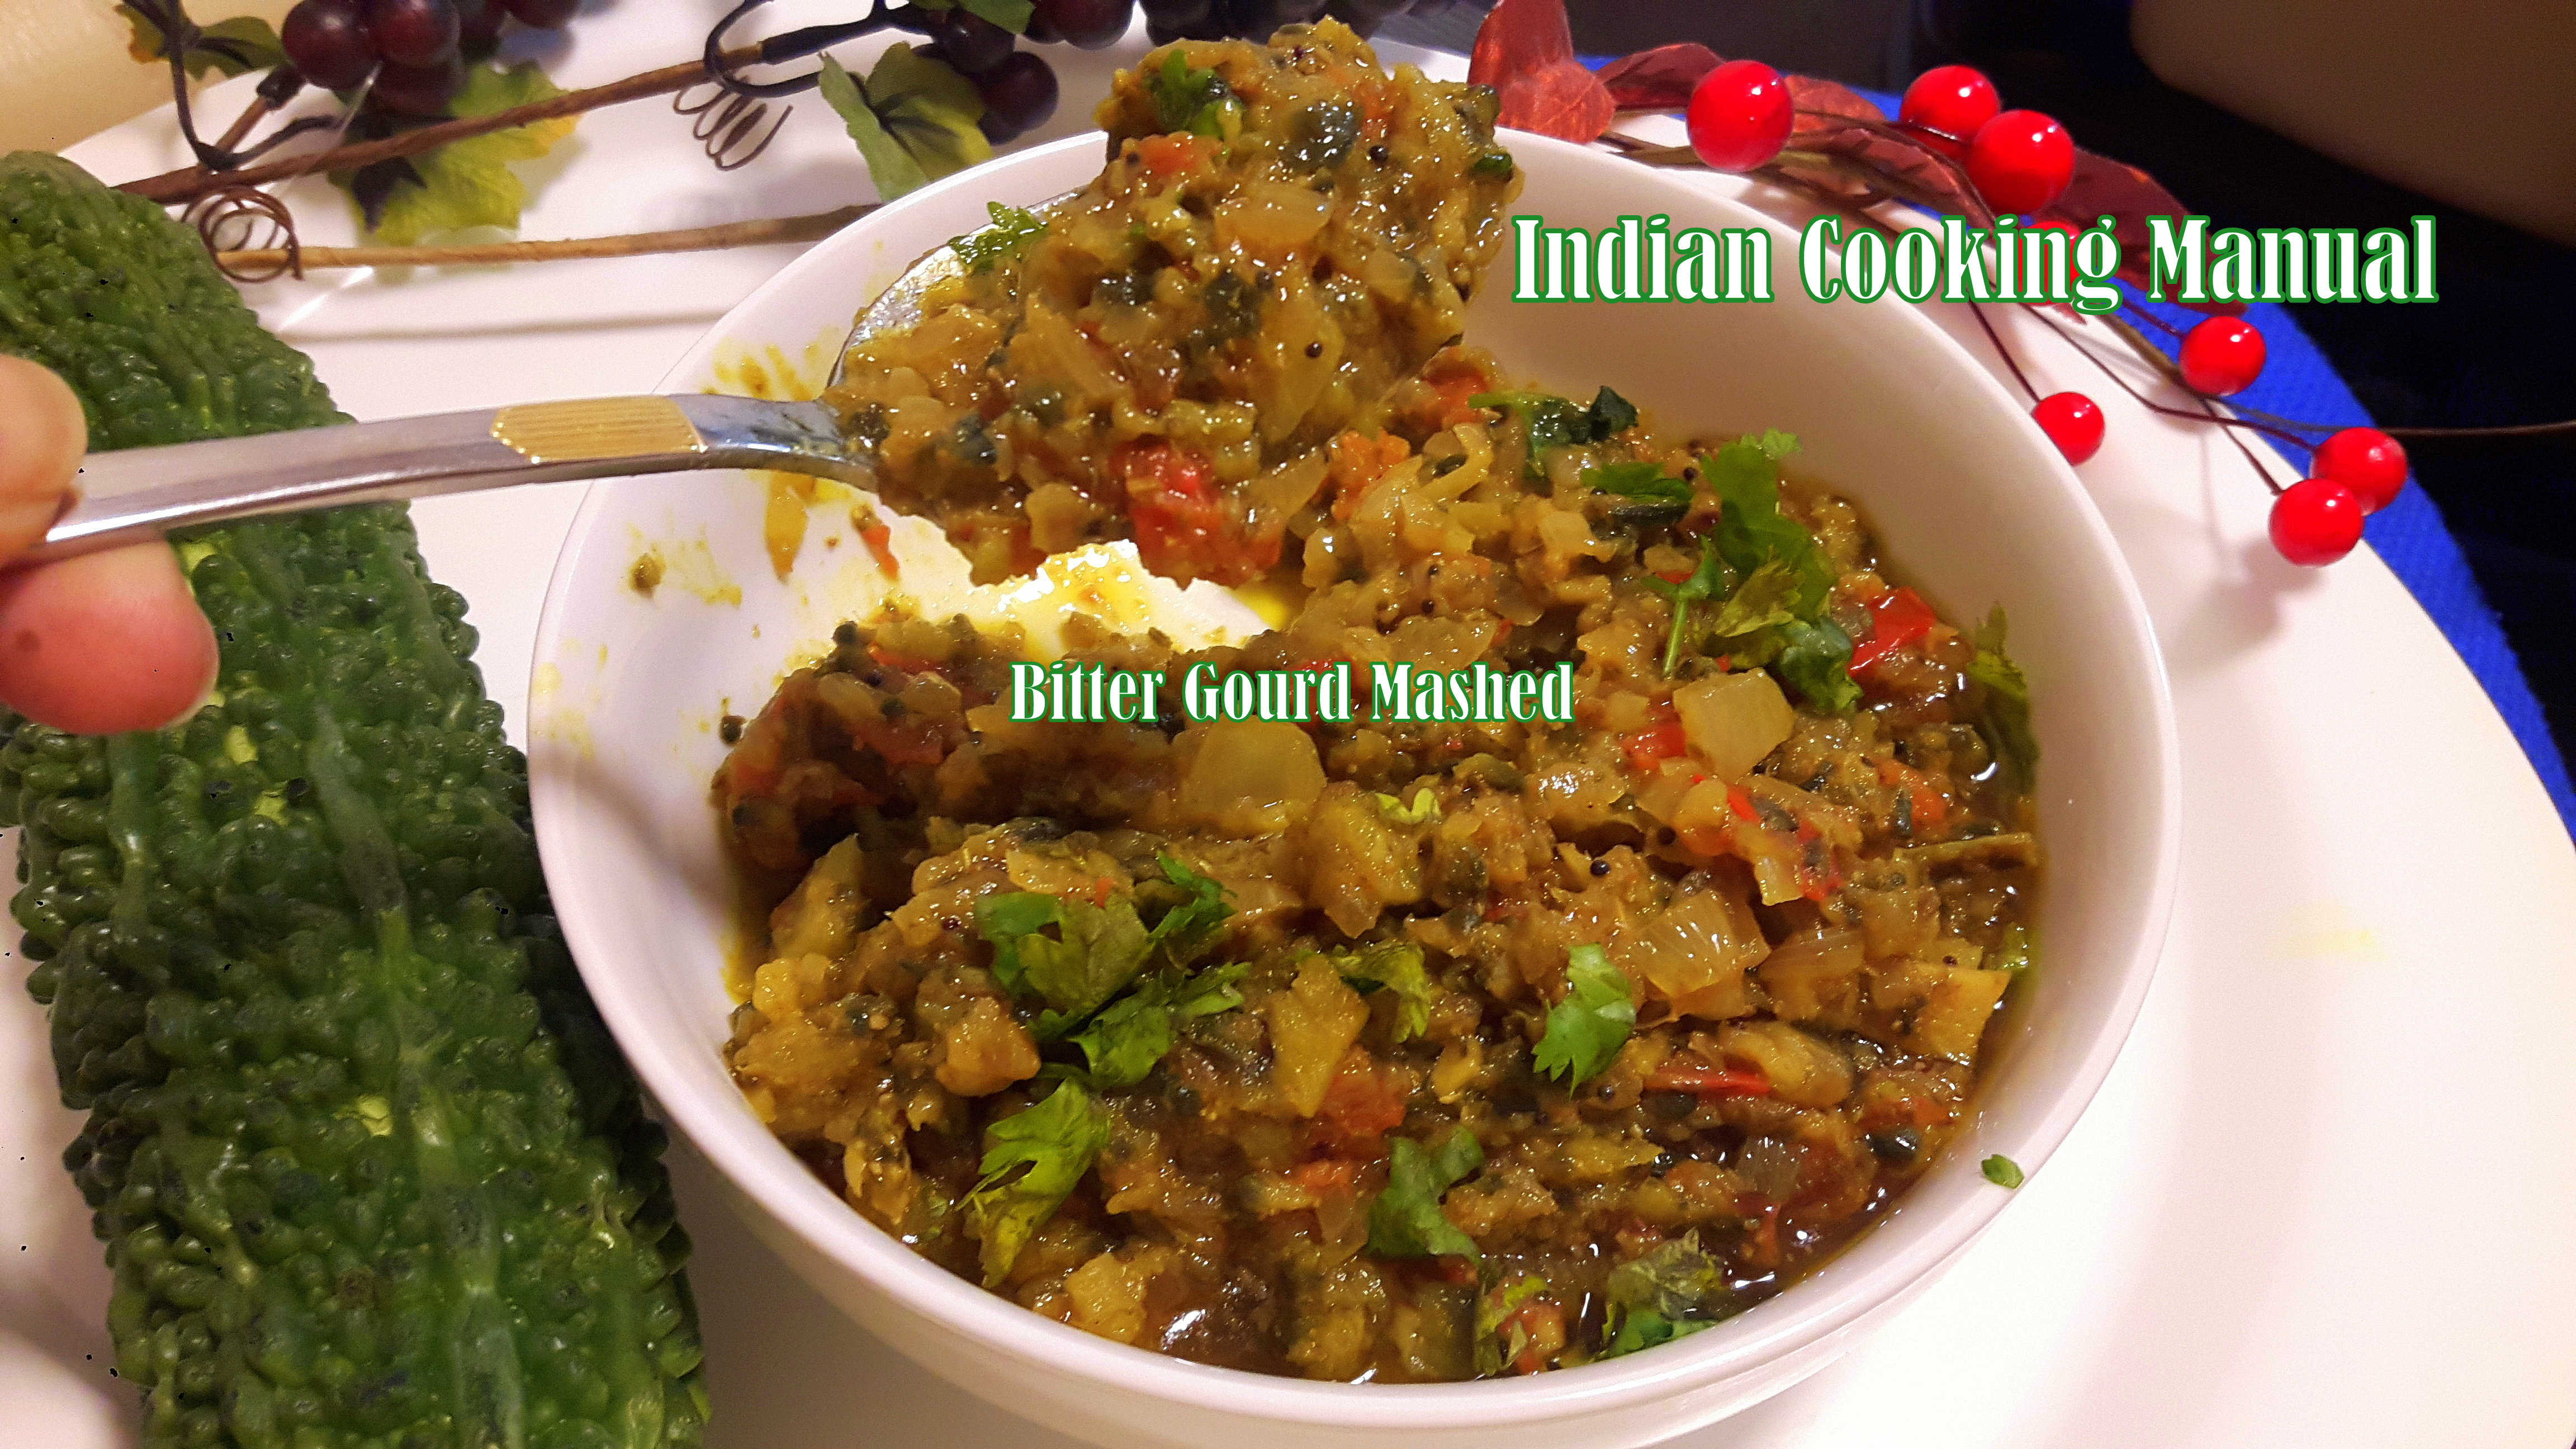 Bitter gourd Mashed (Karela Bharta)